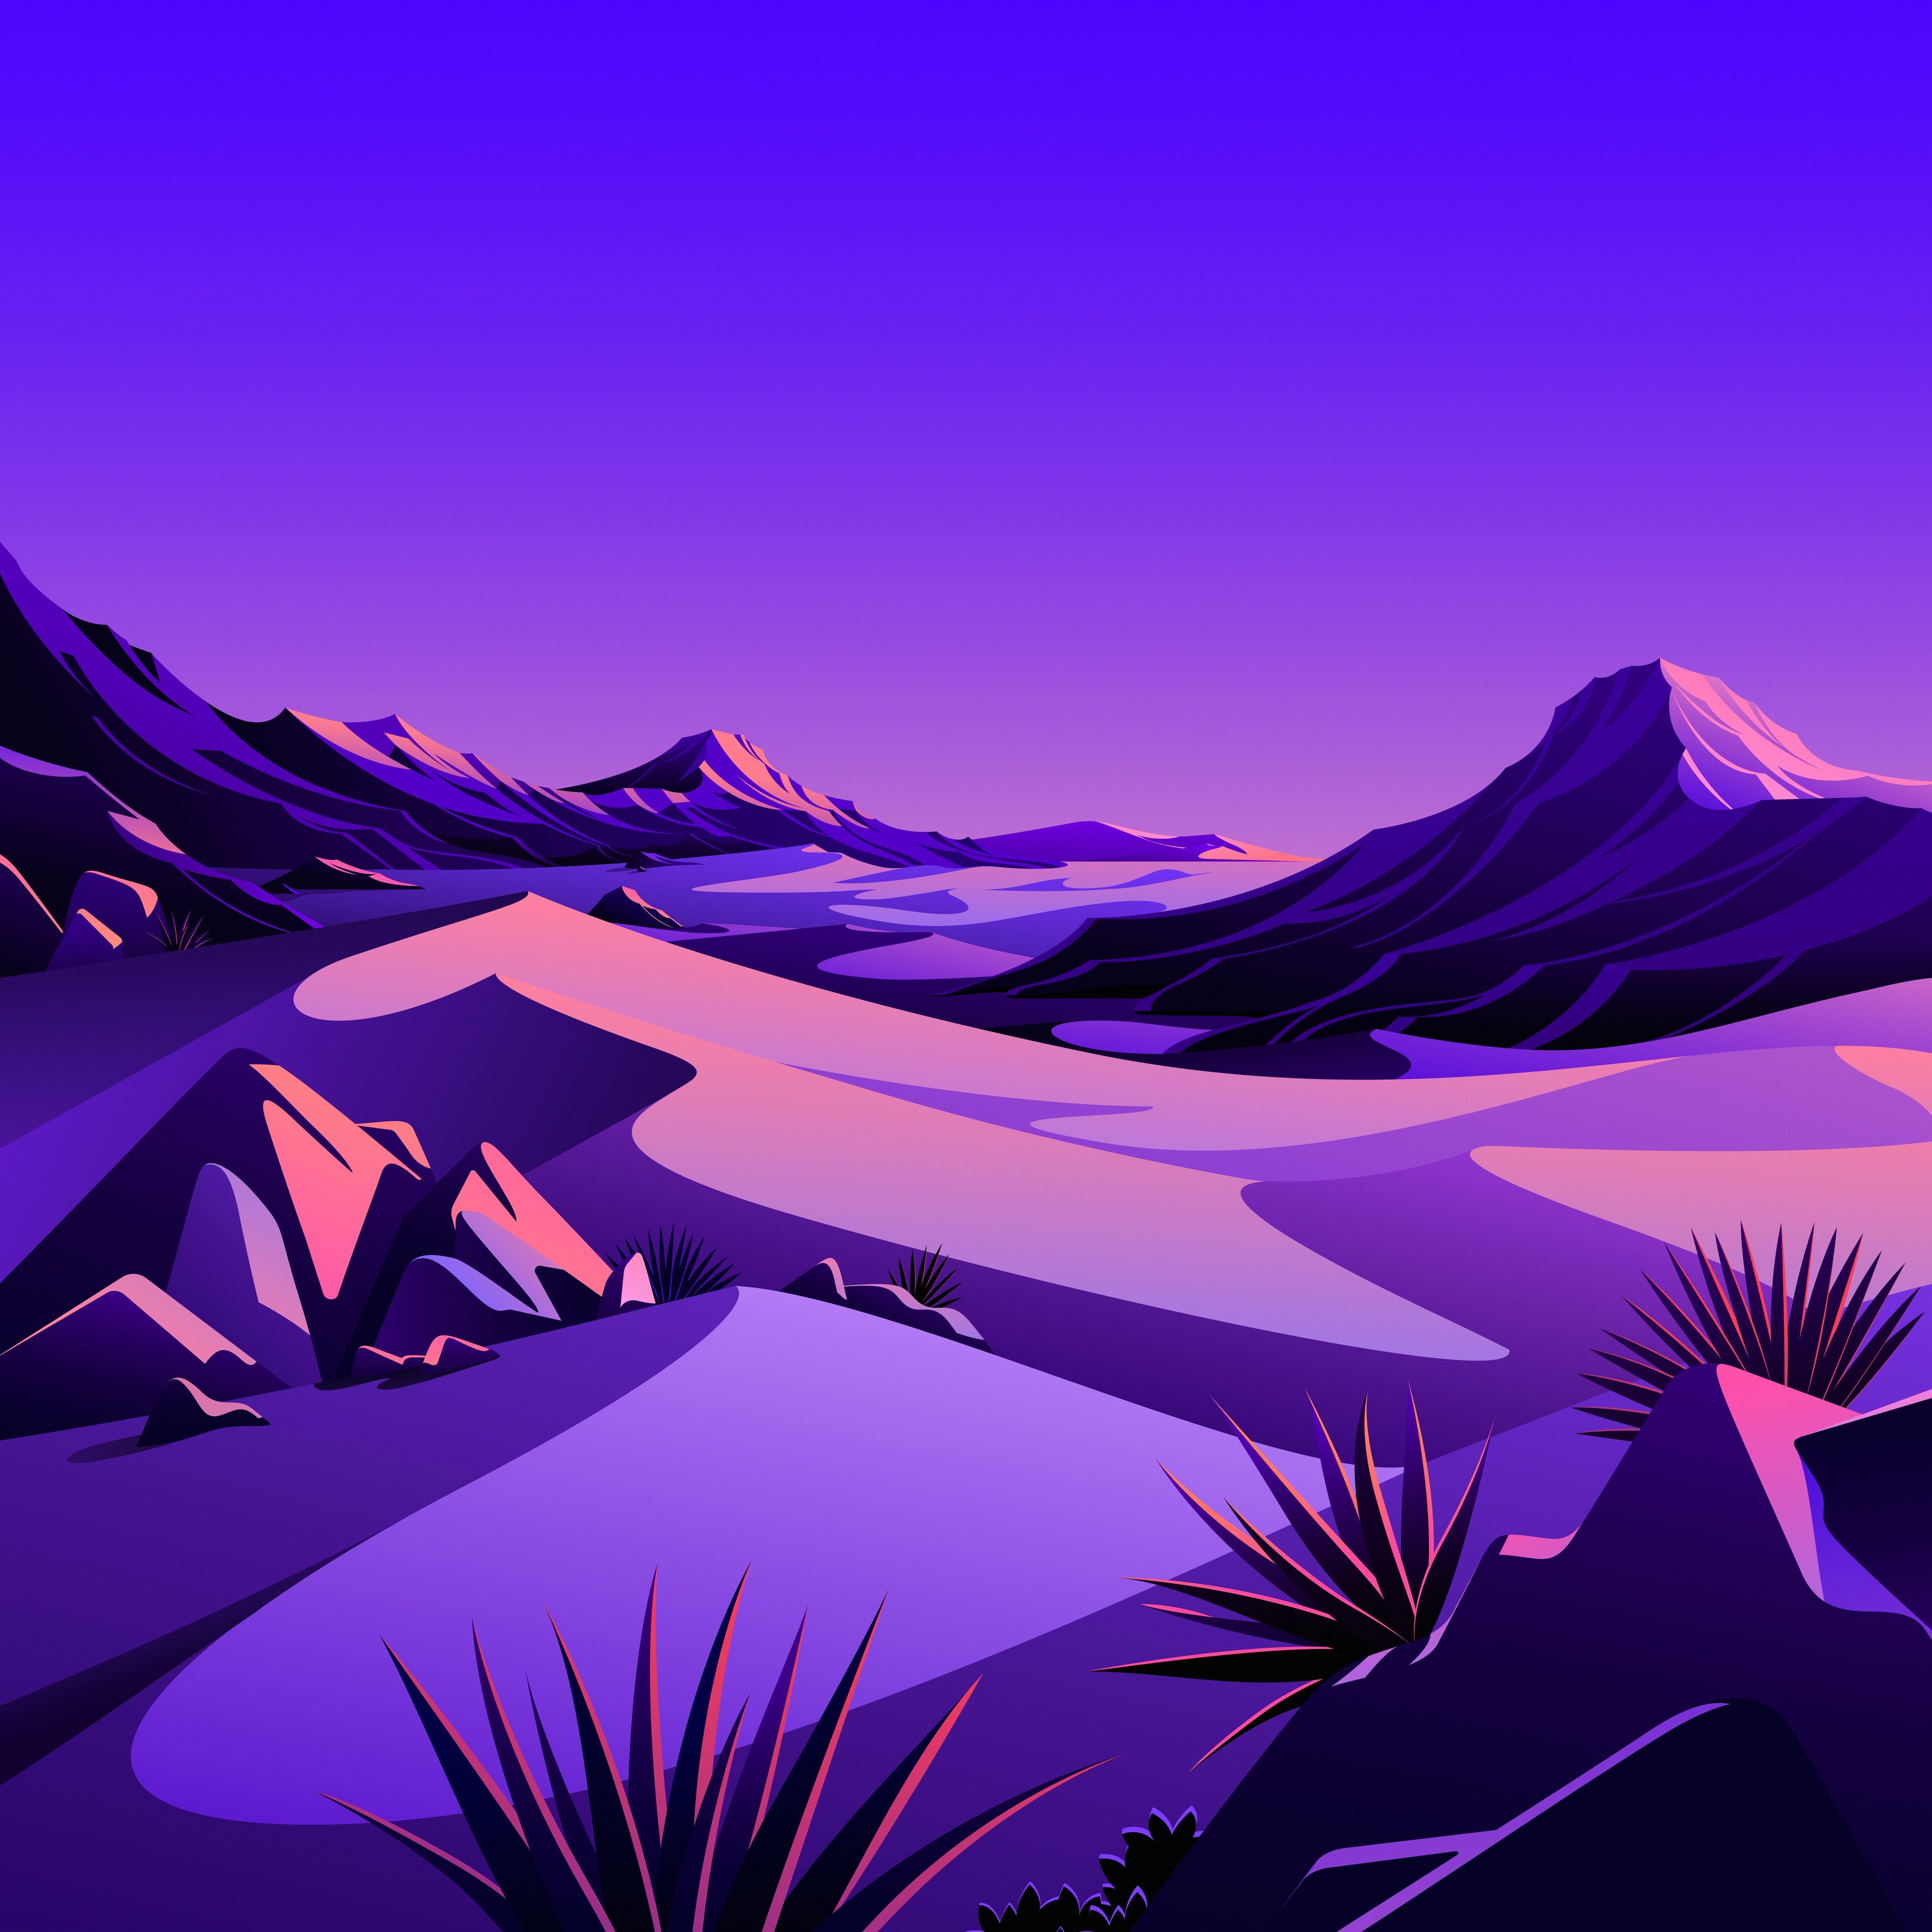 macOS Big Sur The Desert 4 dragged